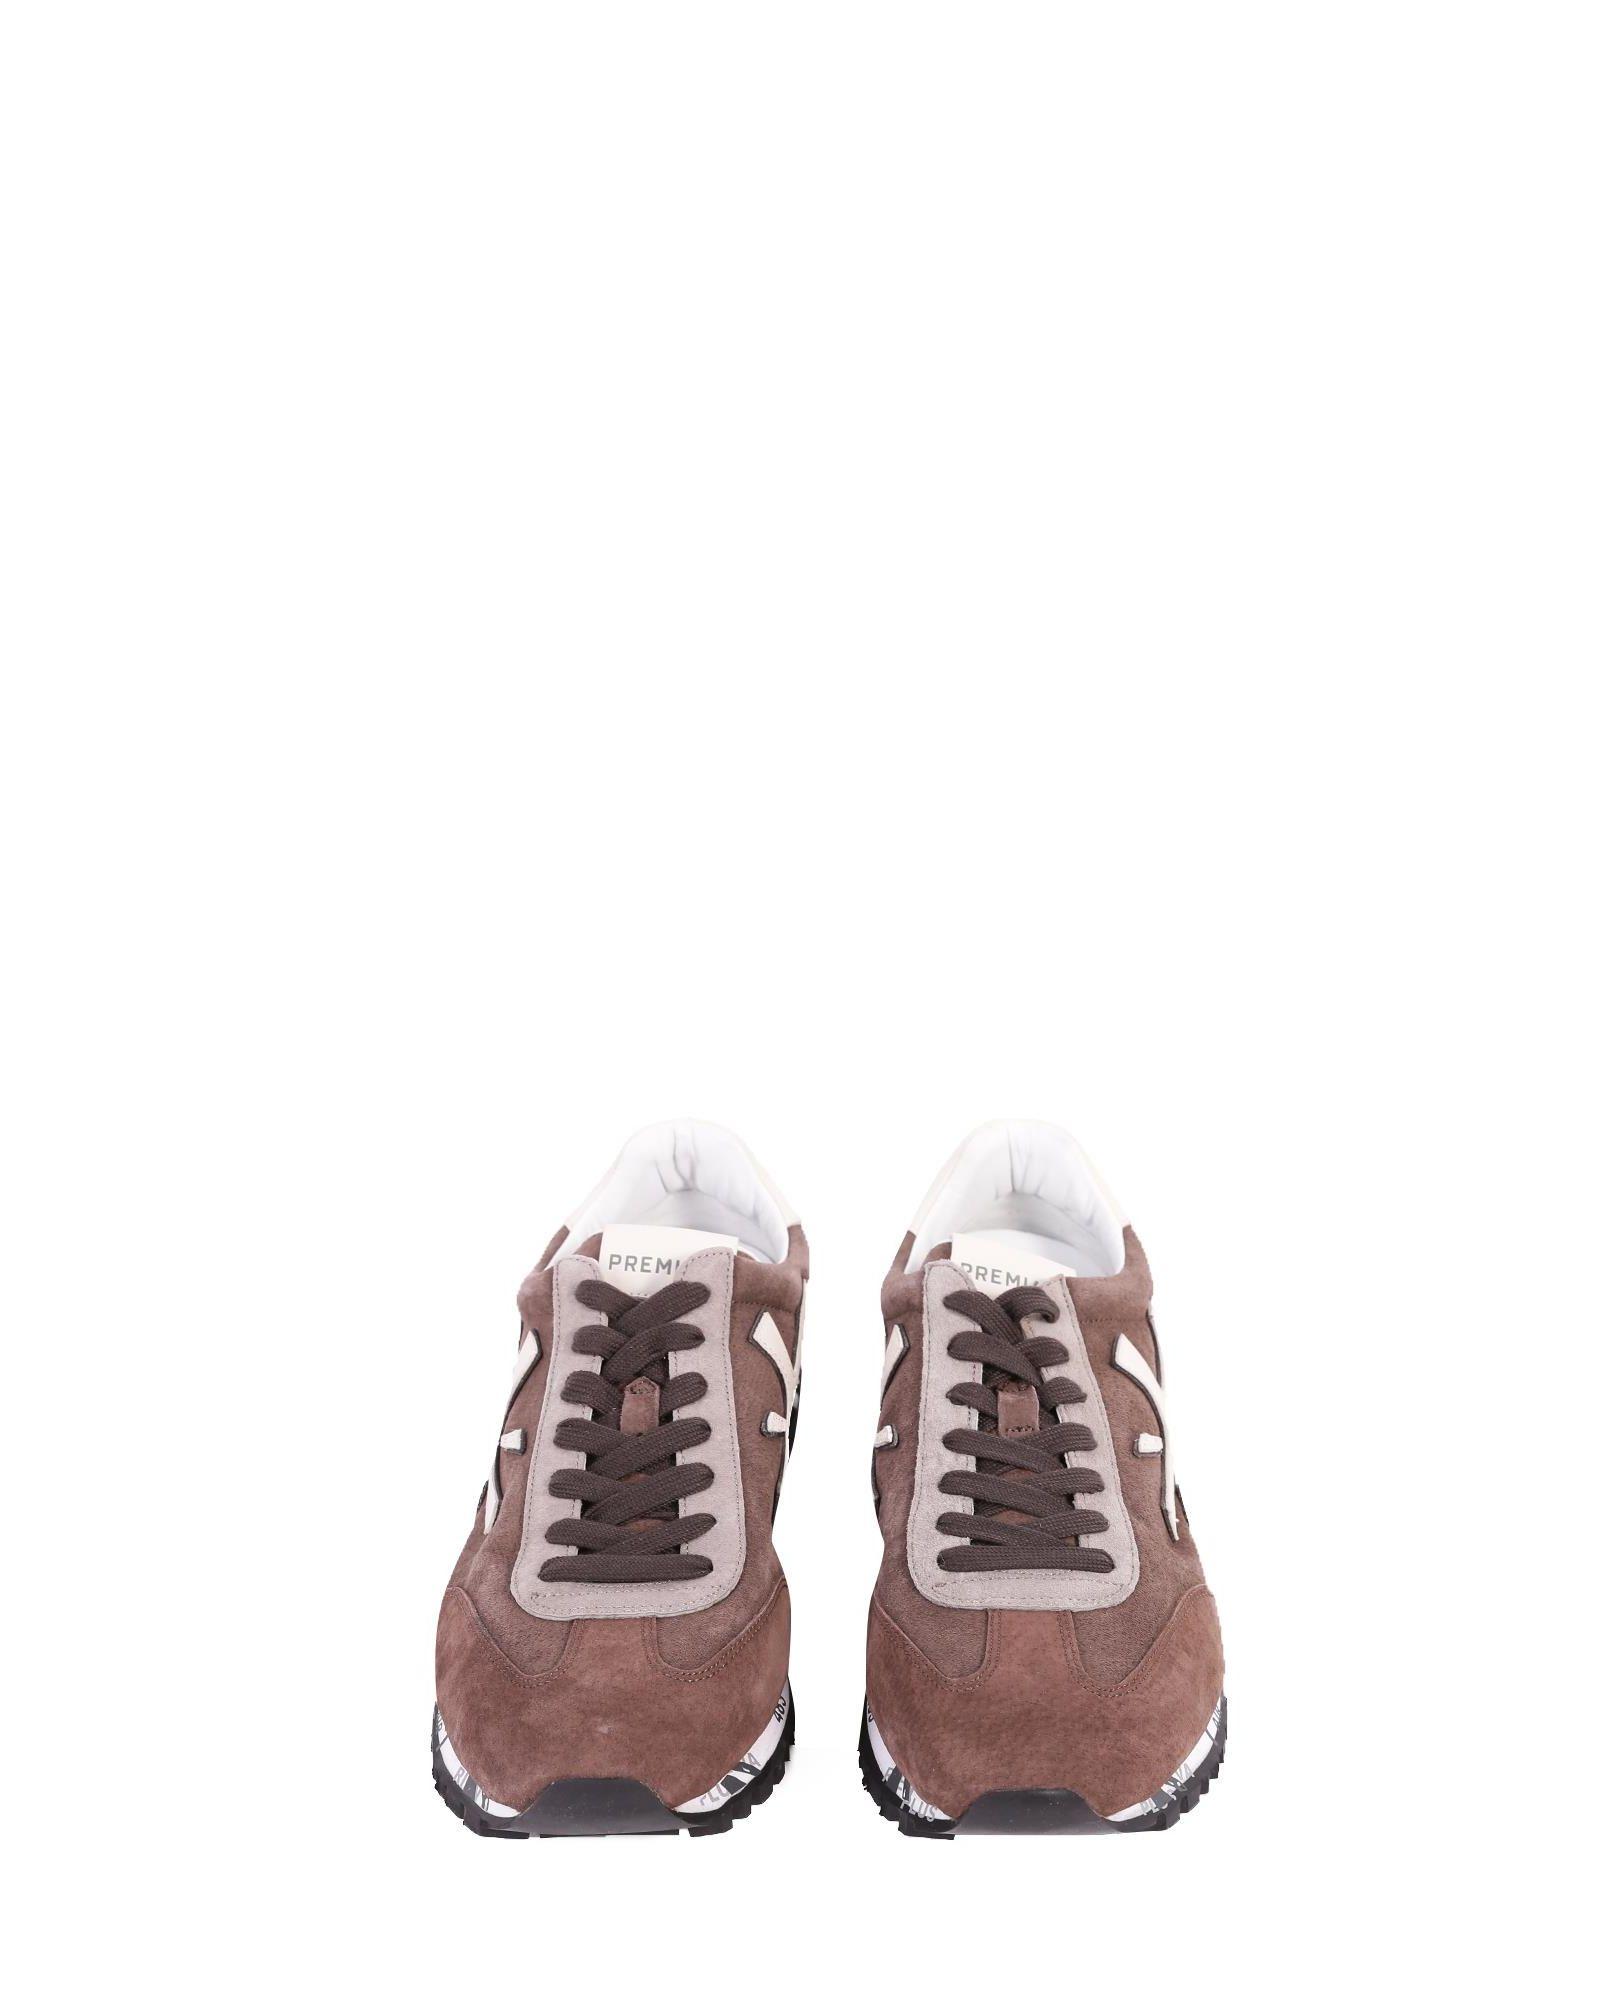 Premiata Sneakers Nourriture Dans 2302 FM3rKQ